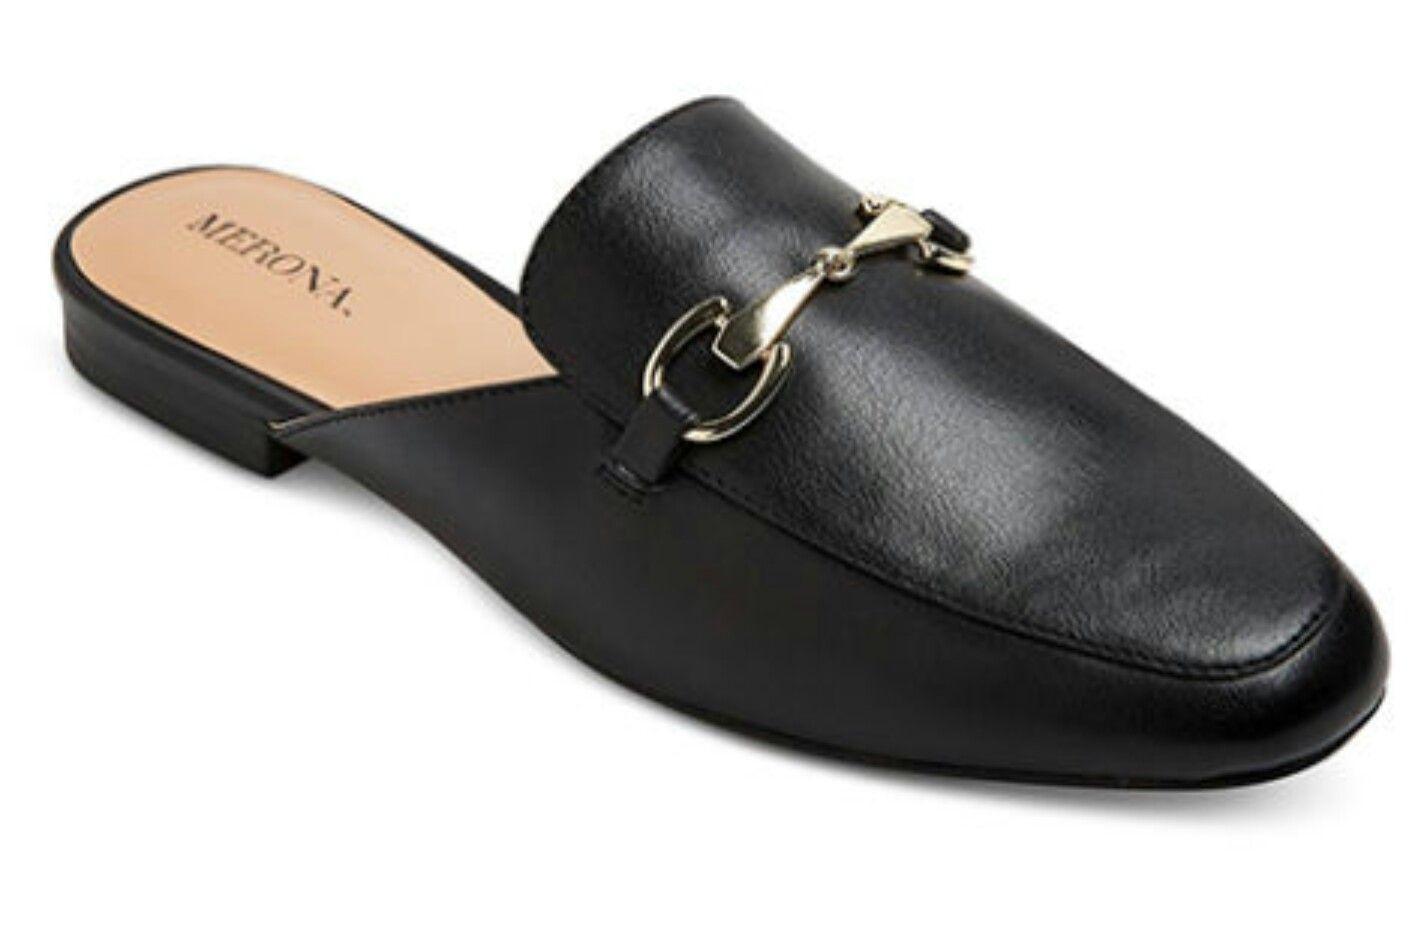 Target Merona backless mule loafers